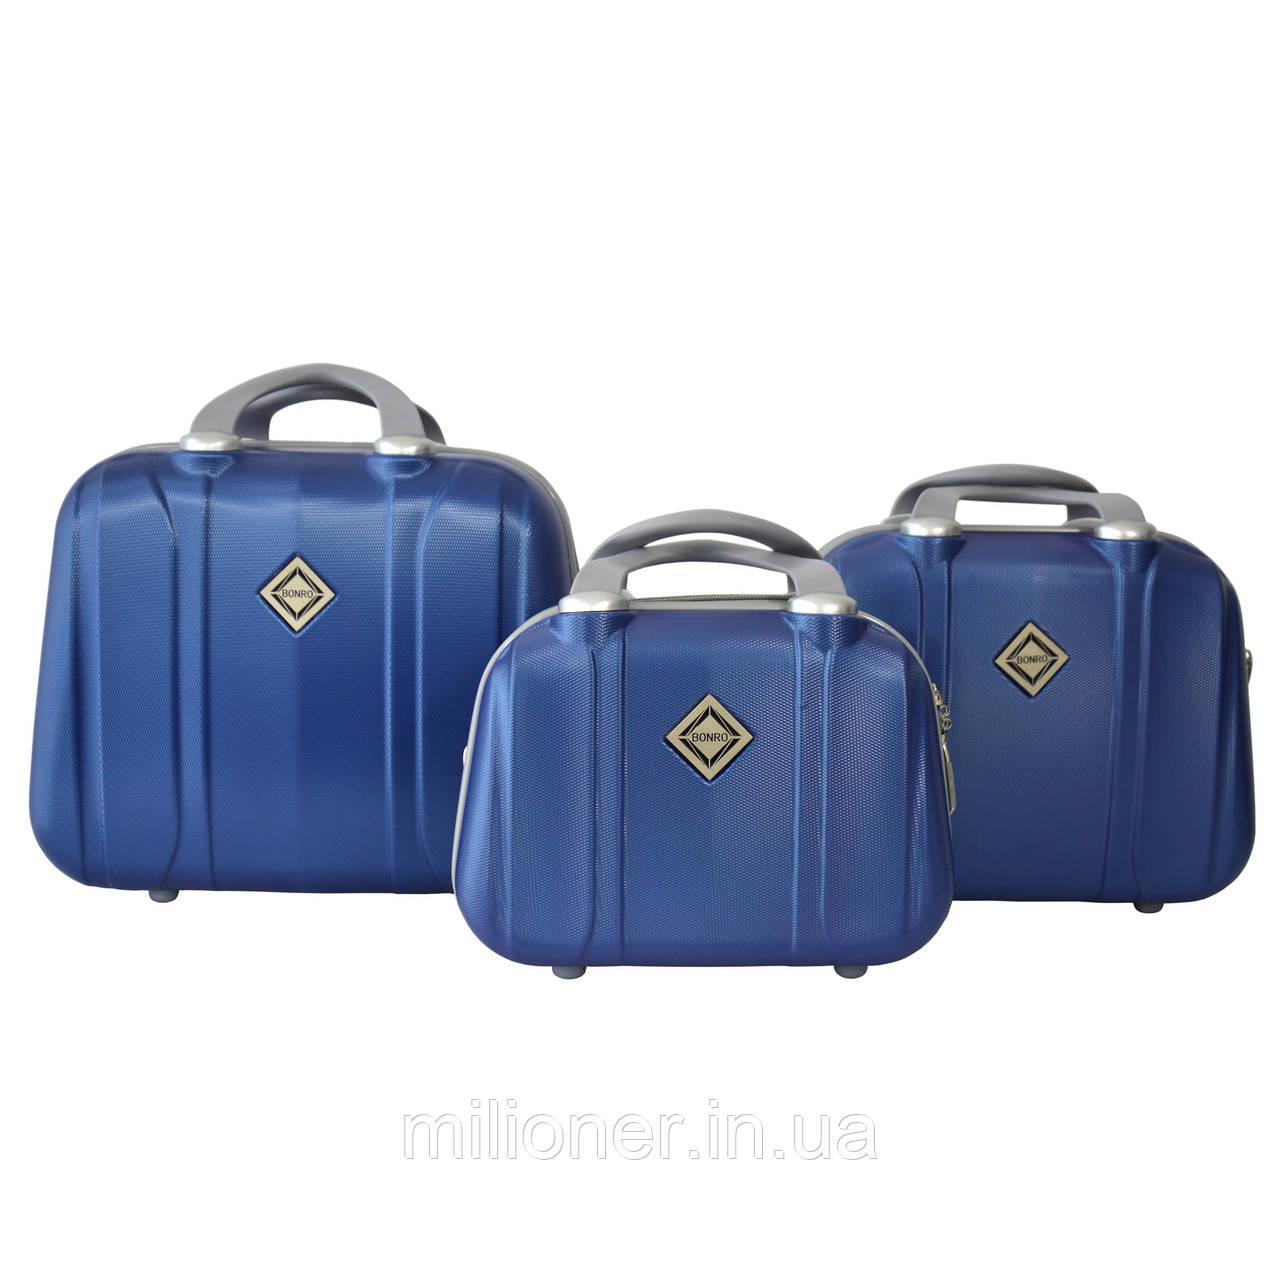 Сумка кейс саквояж 3в1 Bonro Smile синий (blue 629)